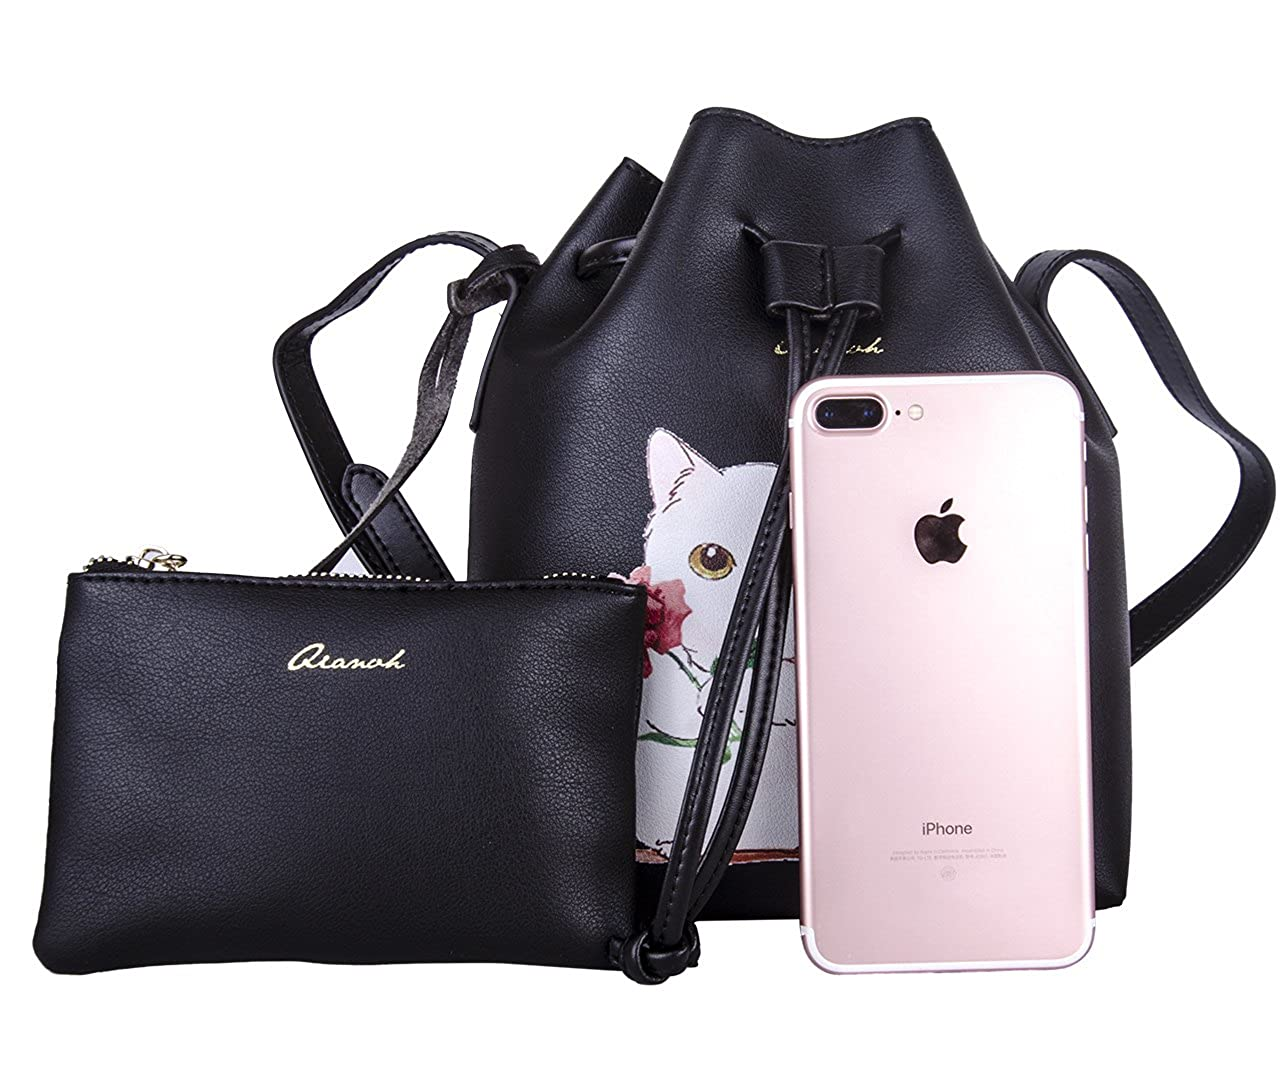 Cat Handbags for Women Leather Handbag Cute Top-handle Shopping Bag QIANBH  Black  Amazon.co.uk  Clothing a4e984ee87220